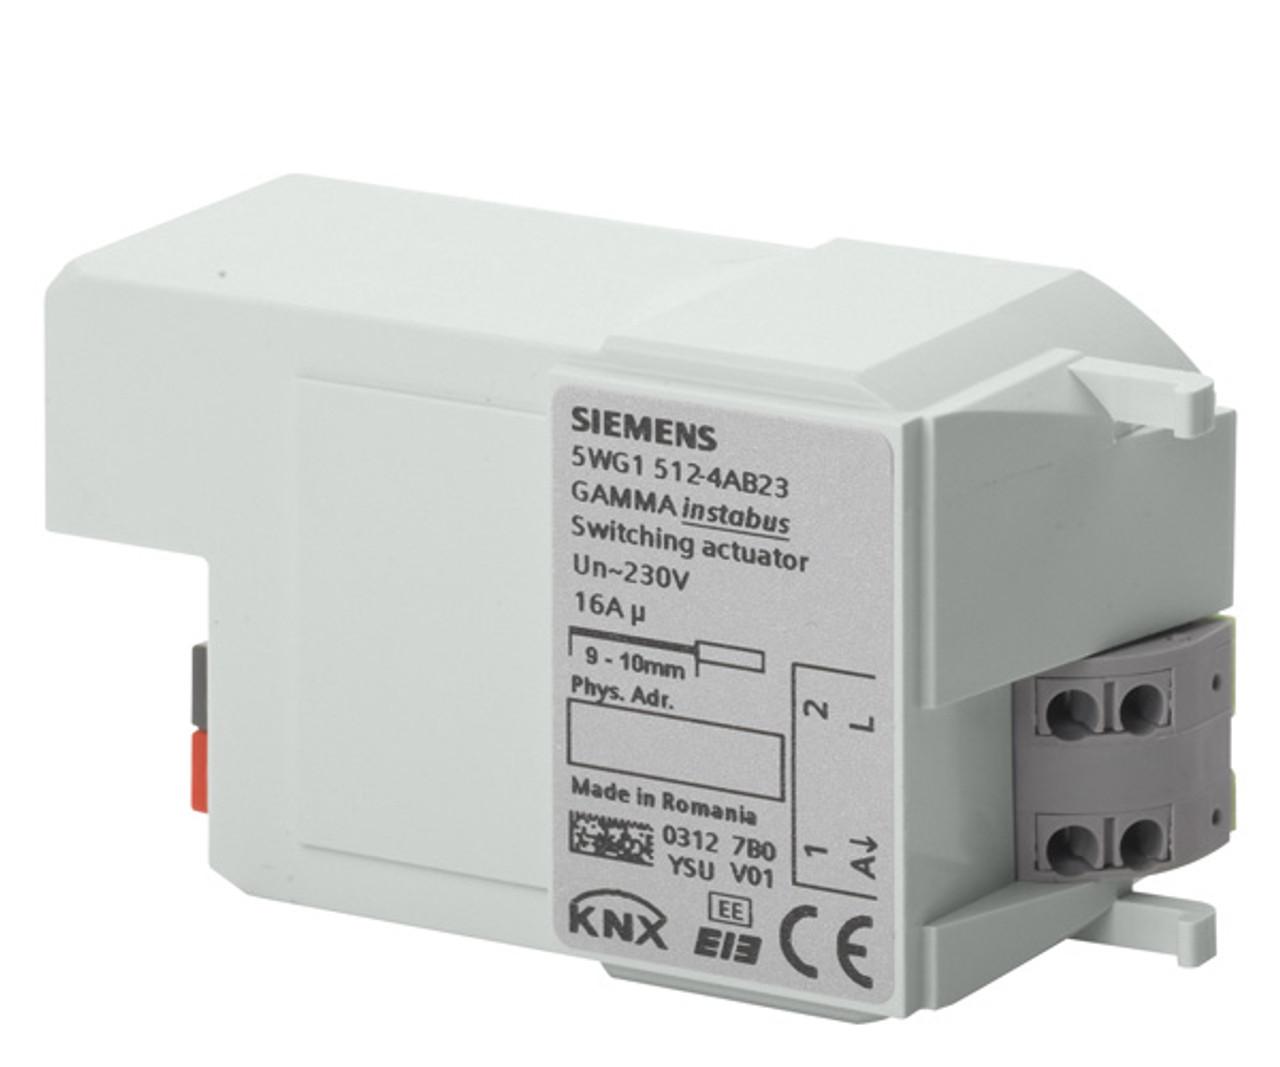 Siemens 5WG1512-4AB23